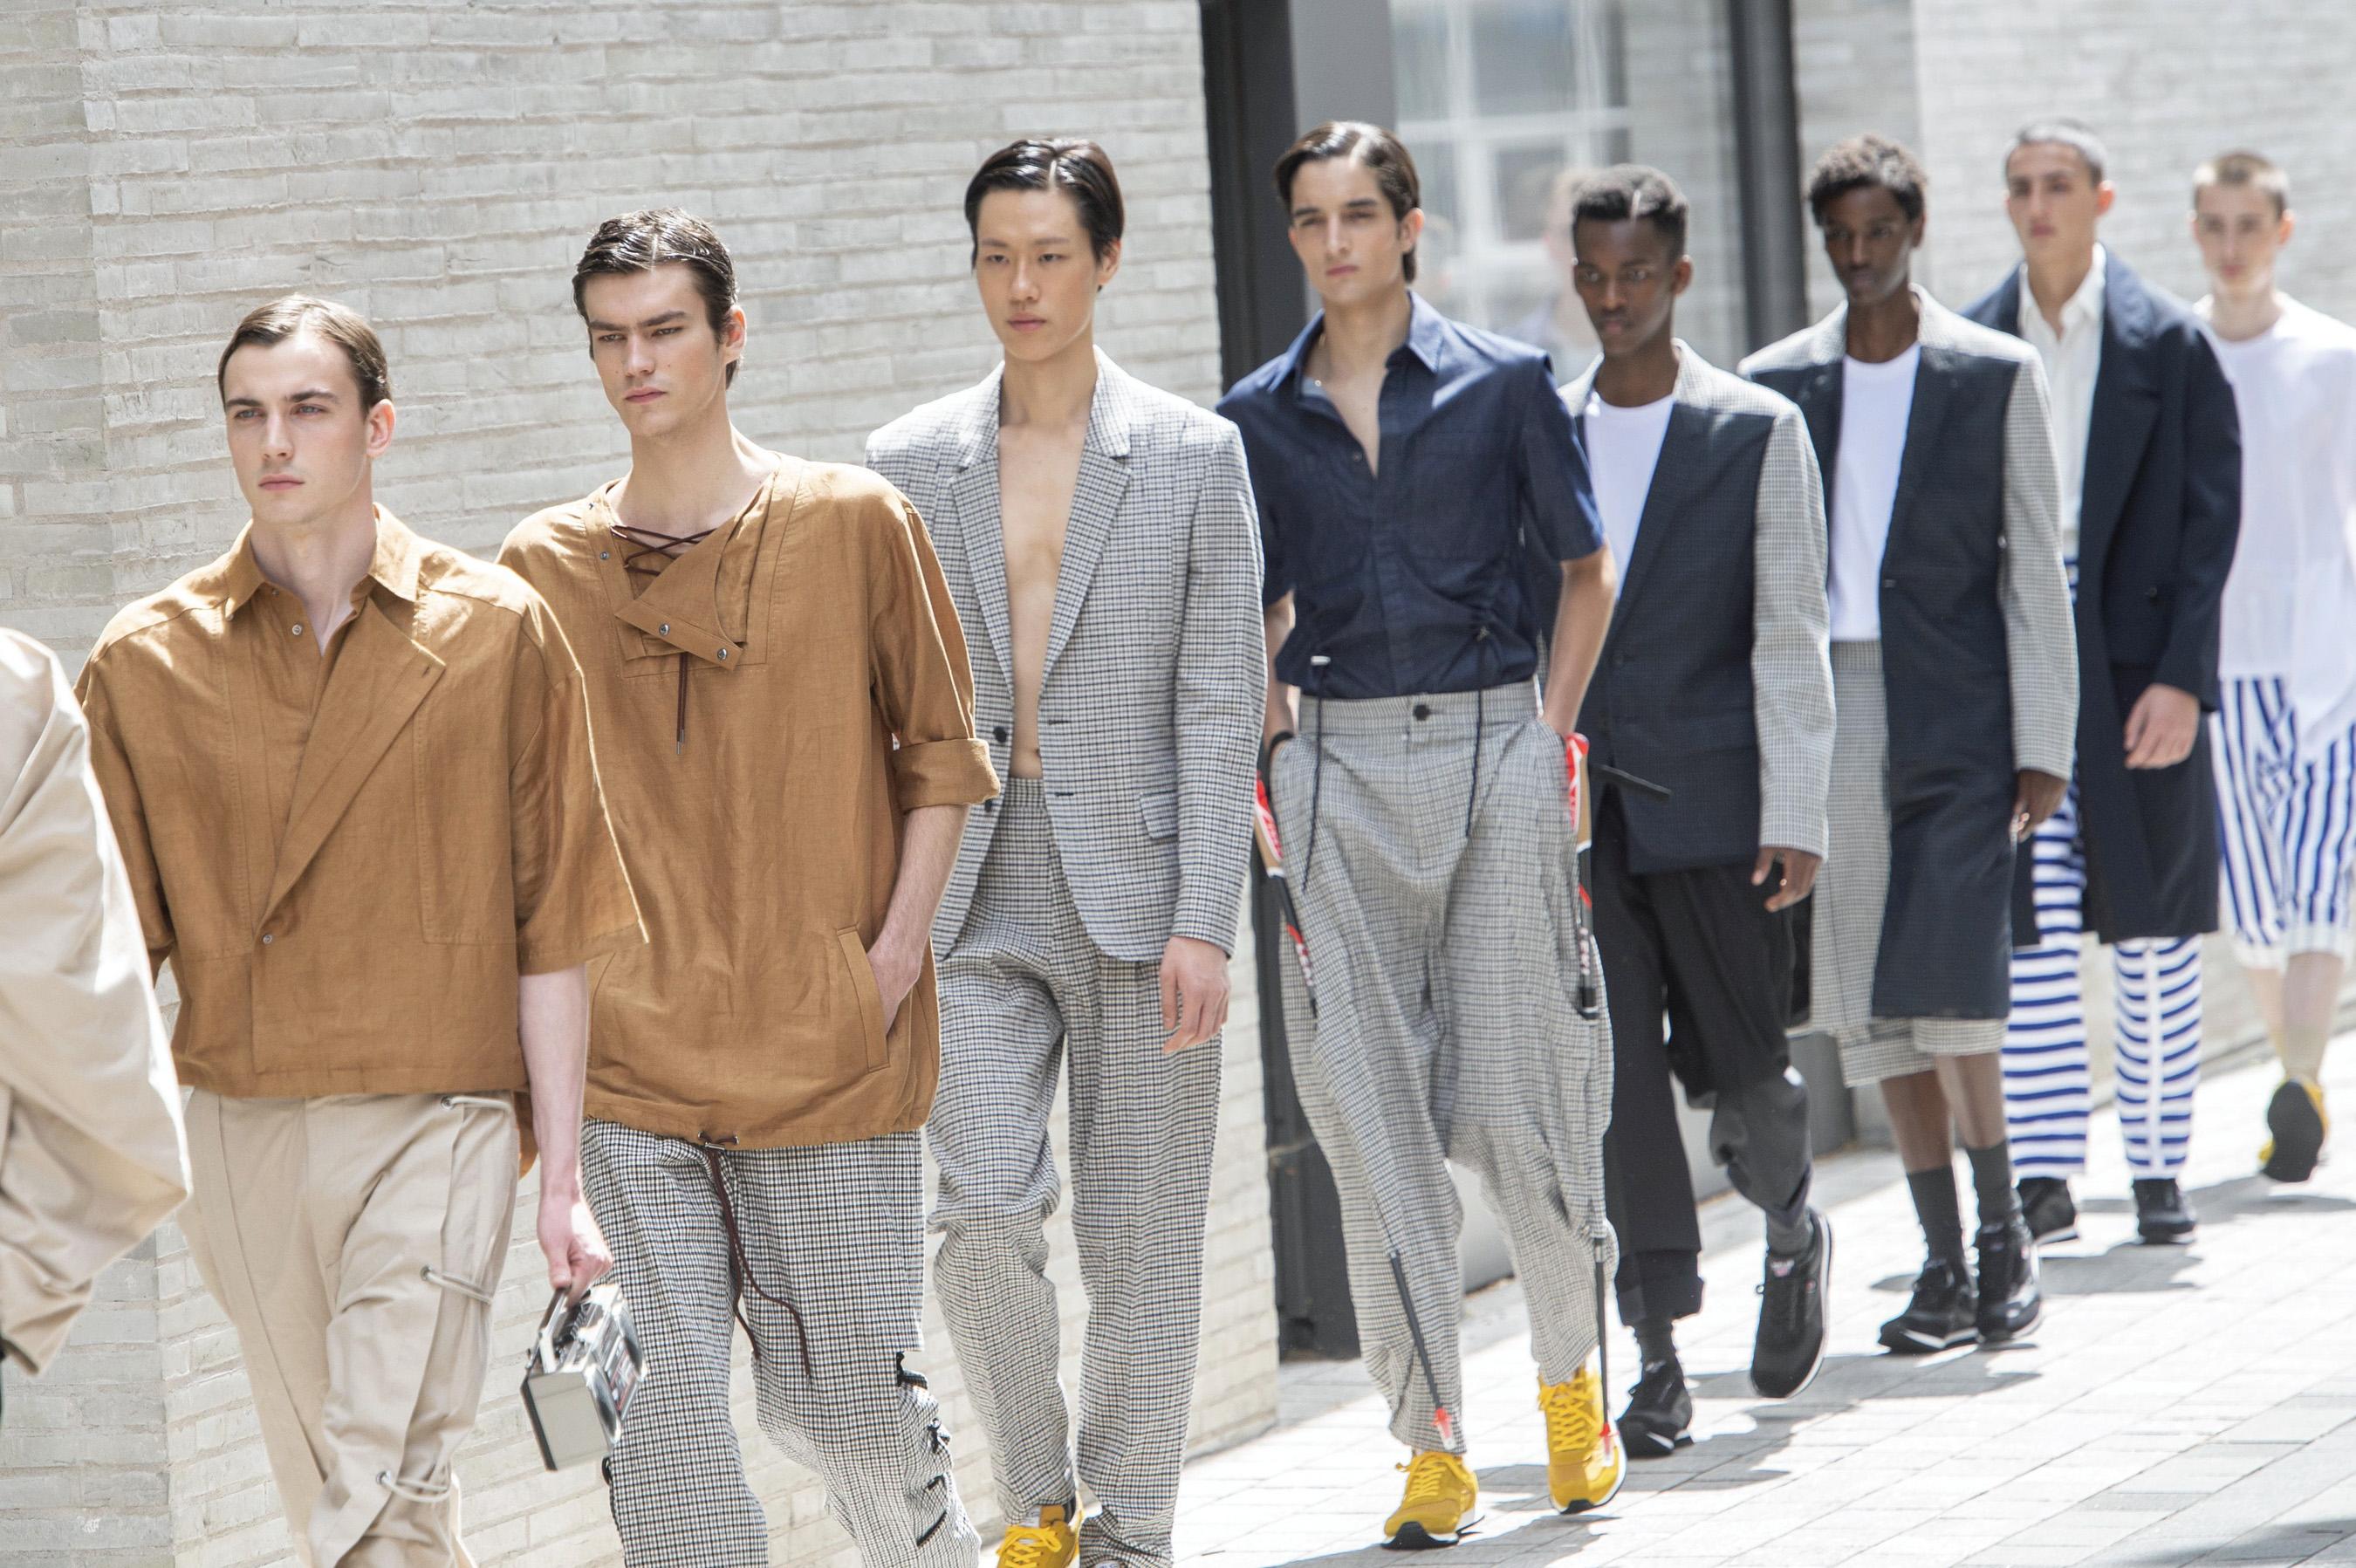 Men's Fashion Week Spring Summer 2020 Overview